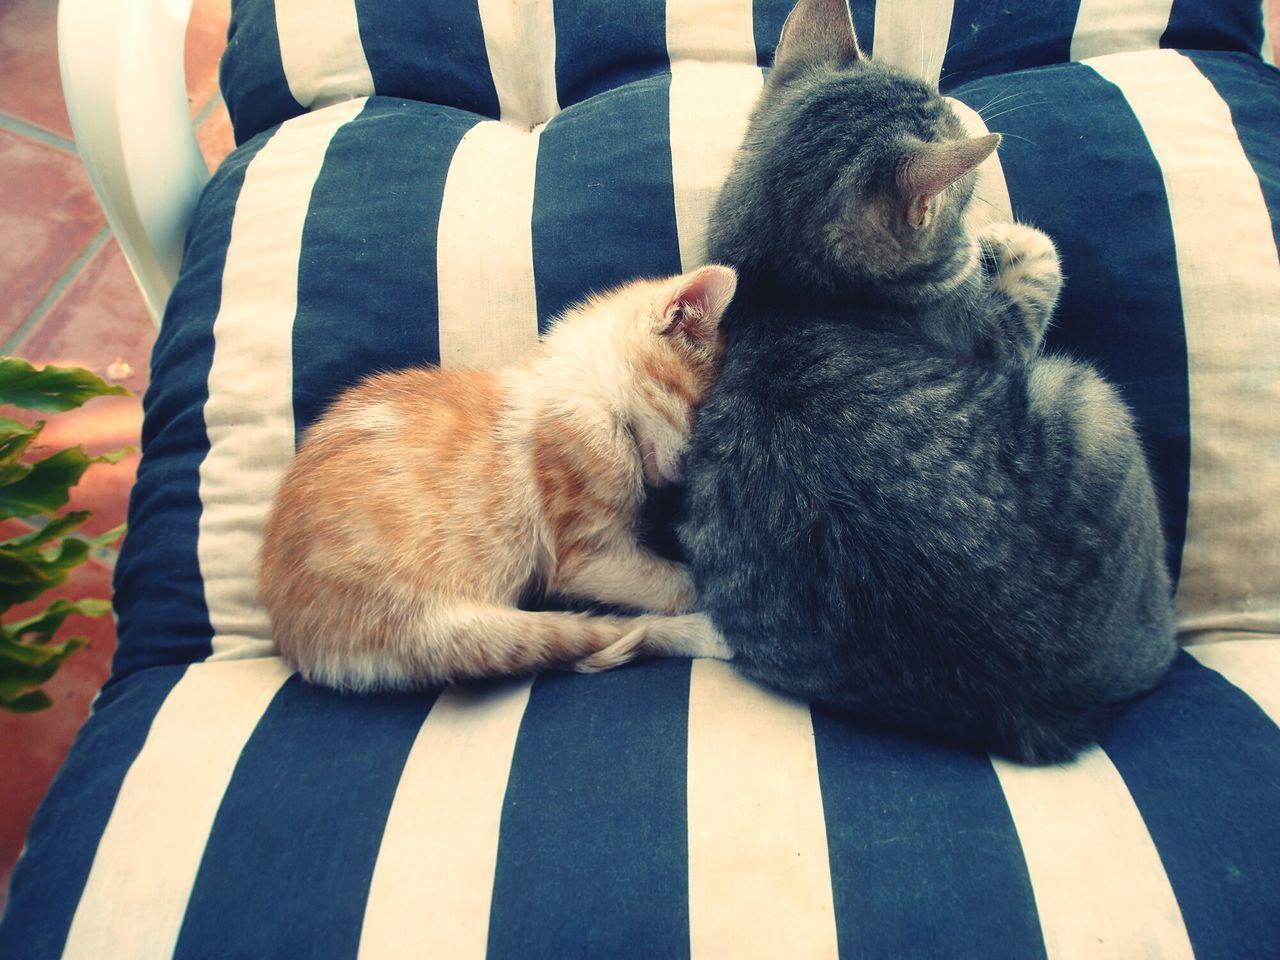 Gatos Gatos 😍 Cat Cats Catstar #cat #catnap #catoftheday #catpic #catlovers #catsconnect #catinstagram #catsofinstagram #gato #gatinhos #gatto #garfield #petstagram #premierpet #photooftheday #petsofinstagram #picoftheday #petlovers #instabicho #ilovecats #ilovemypet #issovici Cats 🐱 Tumbona Hondon De Los Frailes